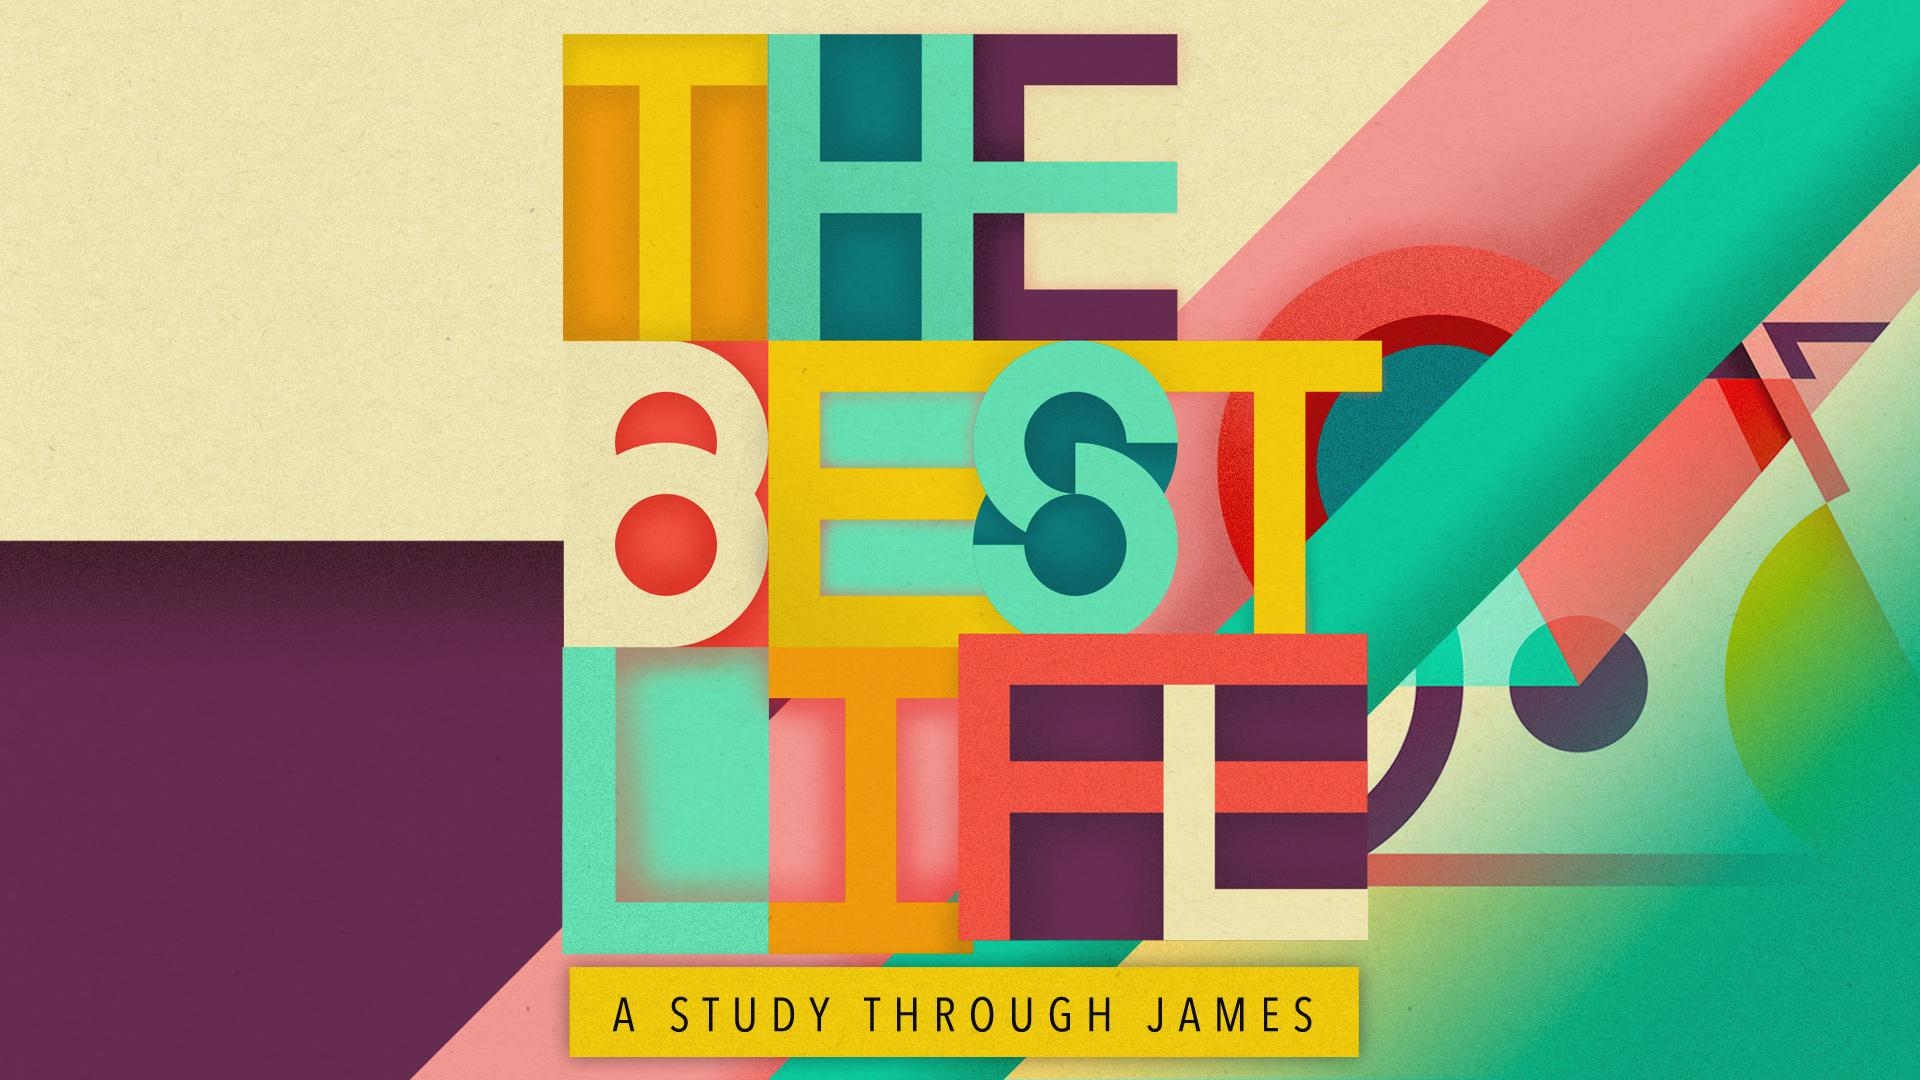 Best-Life_Series-Title.jpg